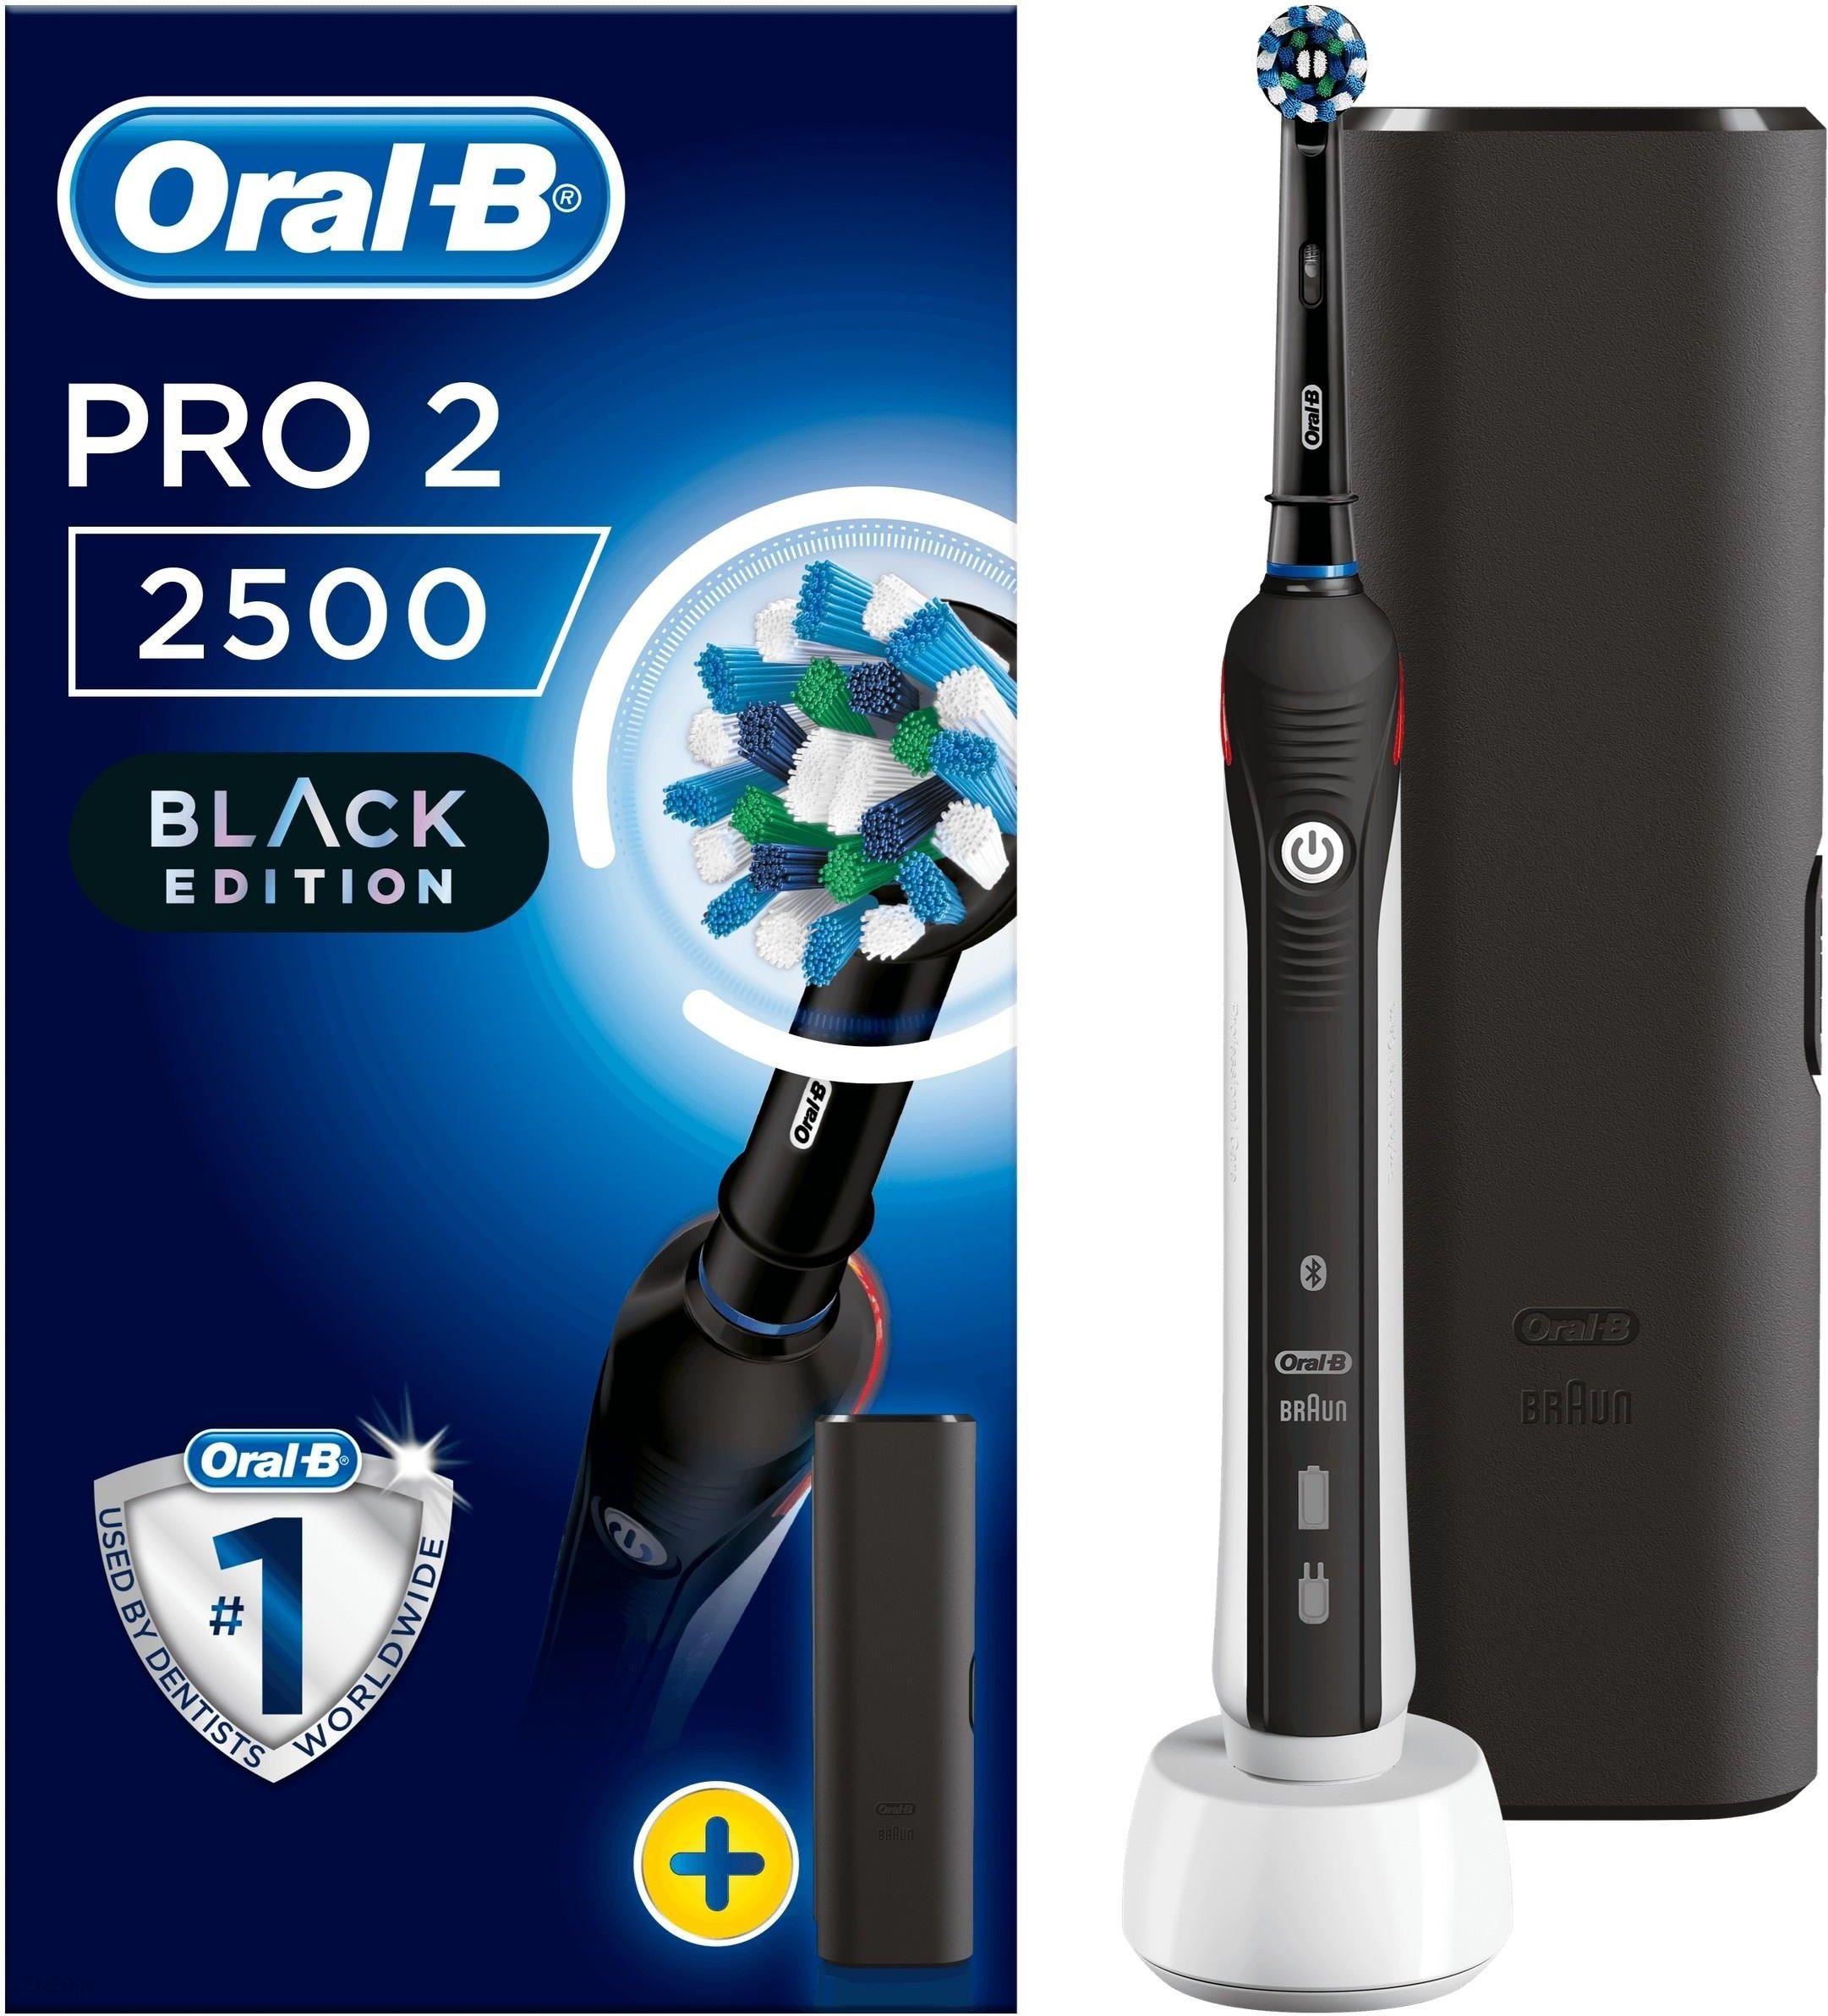 Oral-B Pro 2500 CA BLACK EDITION